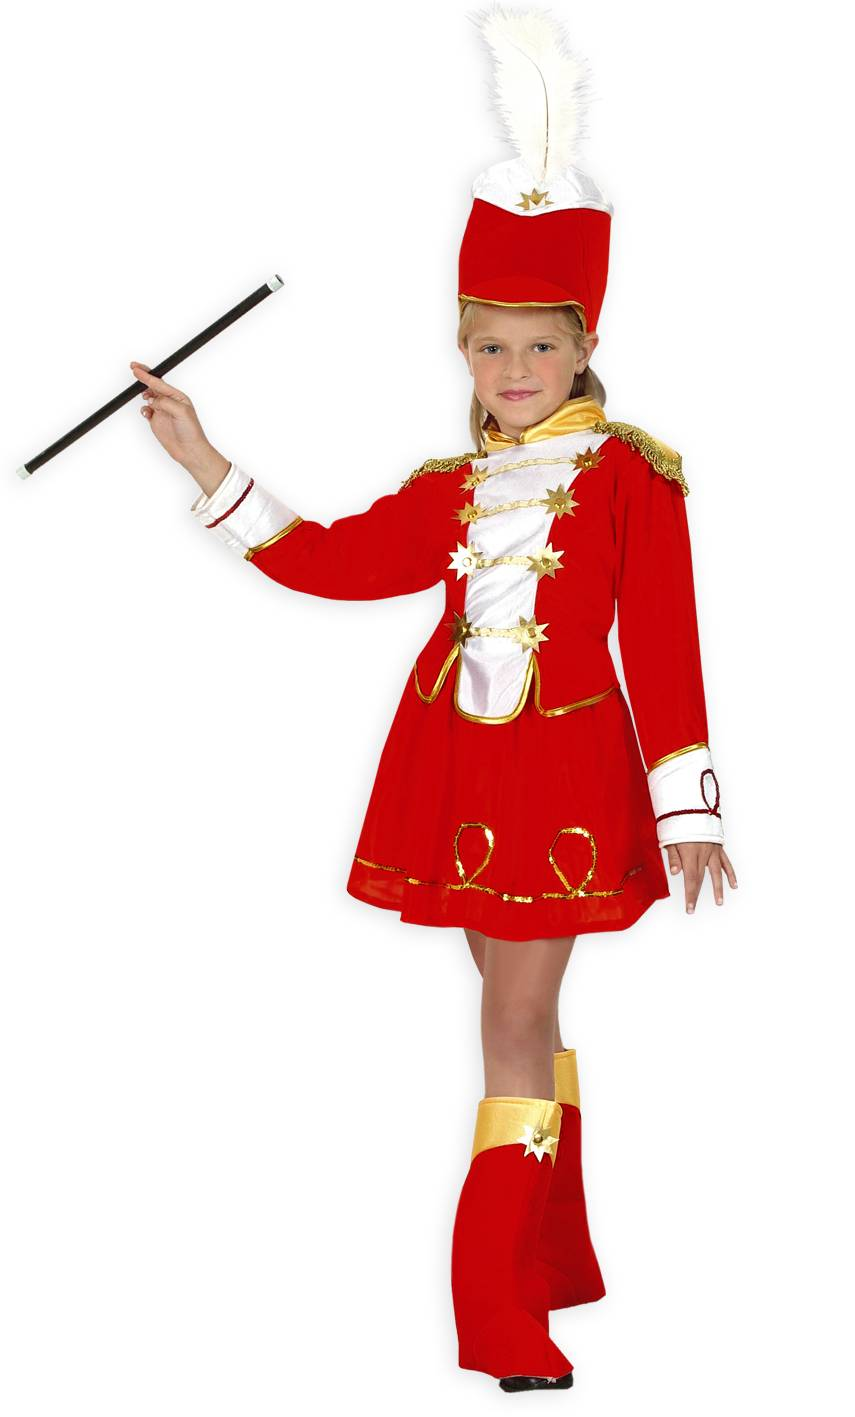 Costume-Majorette-Fille-D11